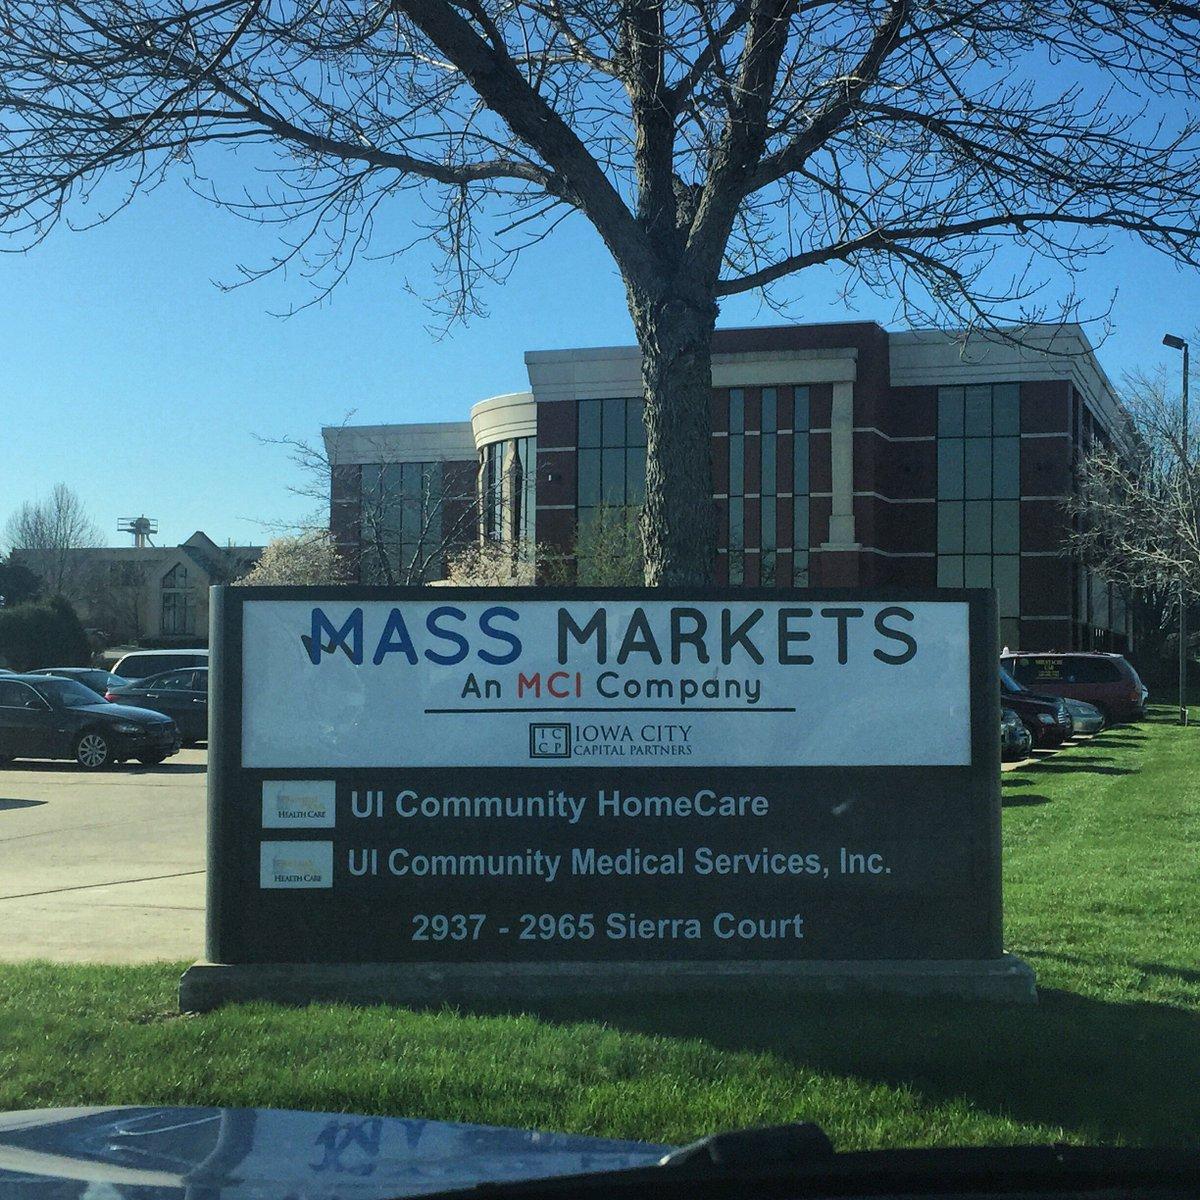 #MassMarkets HQ = #XAAS #BPO #omnichannel #sales & #custserv #contactcenters in the #USA https://t.co/6lw7oODfcc https://t.co/5IOz1x8bg5